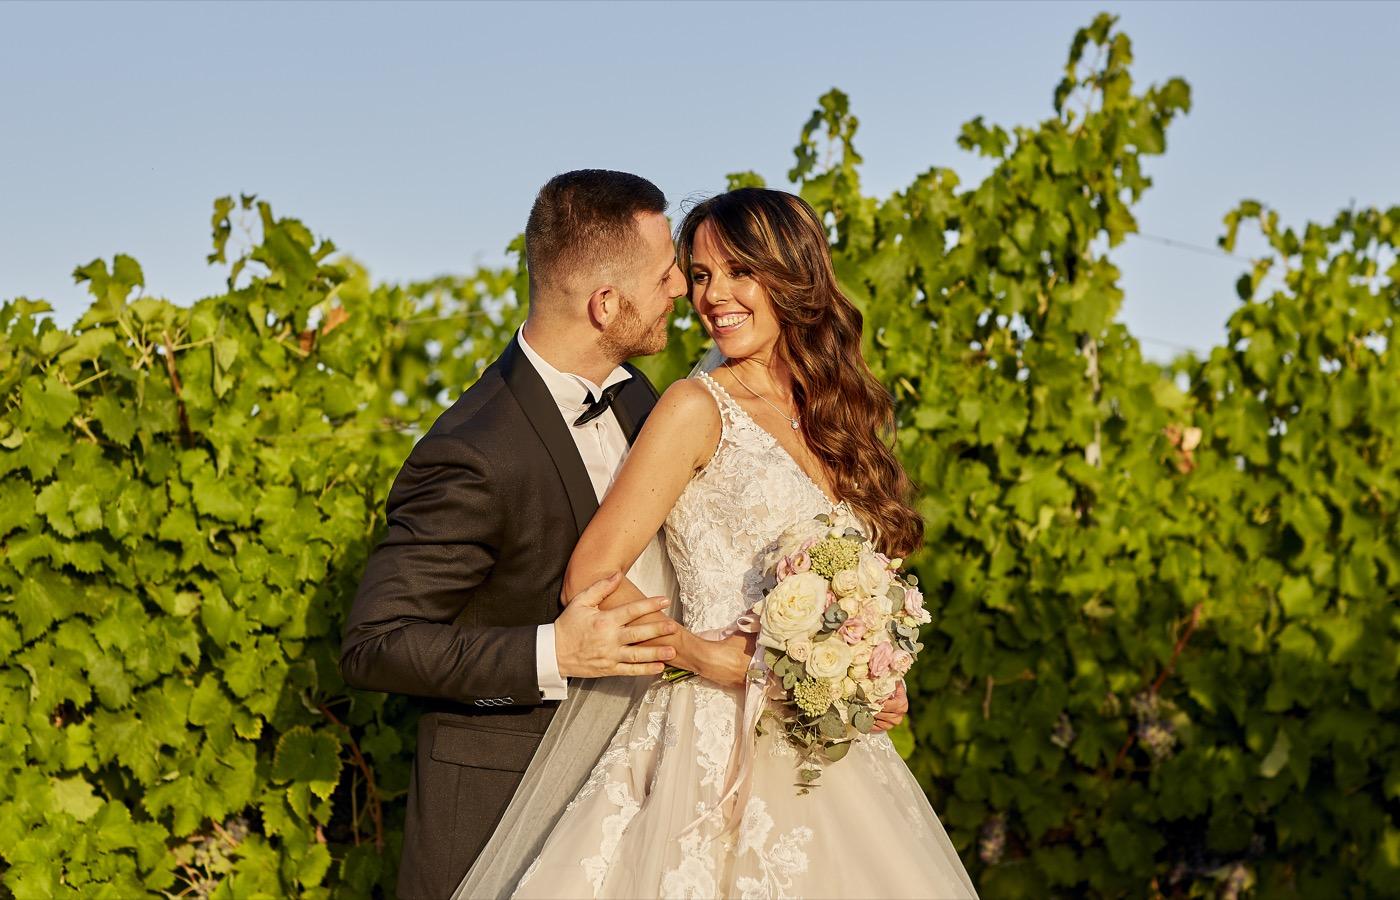 Claudio-Coppola-wedding-photographer-la-scuderia-eventi-preparativi-la-rosetta-perugia-69